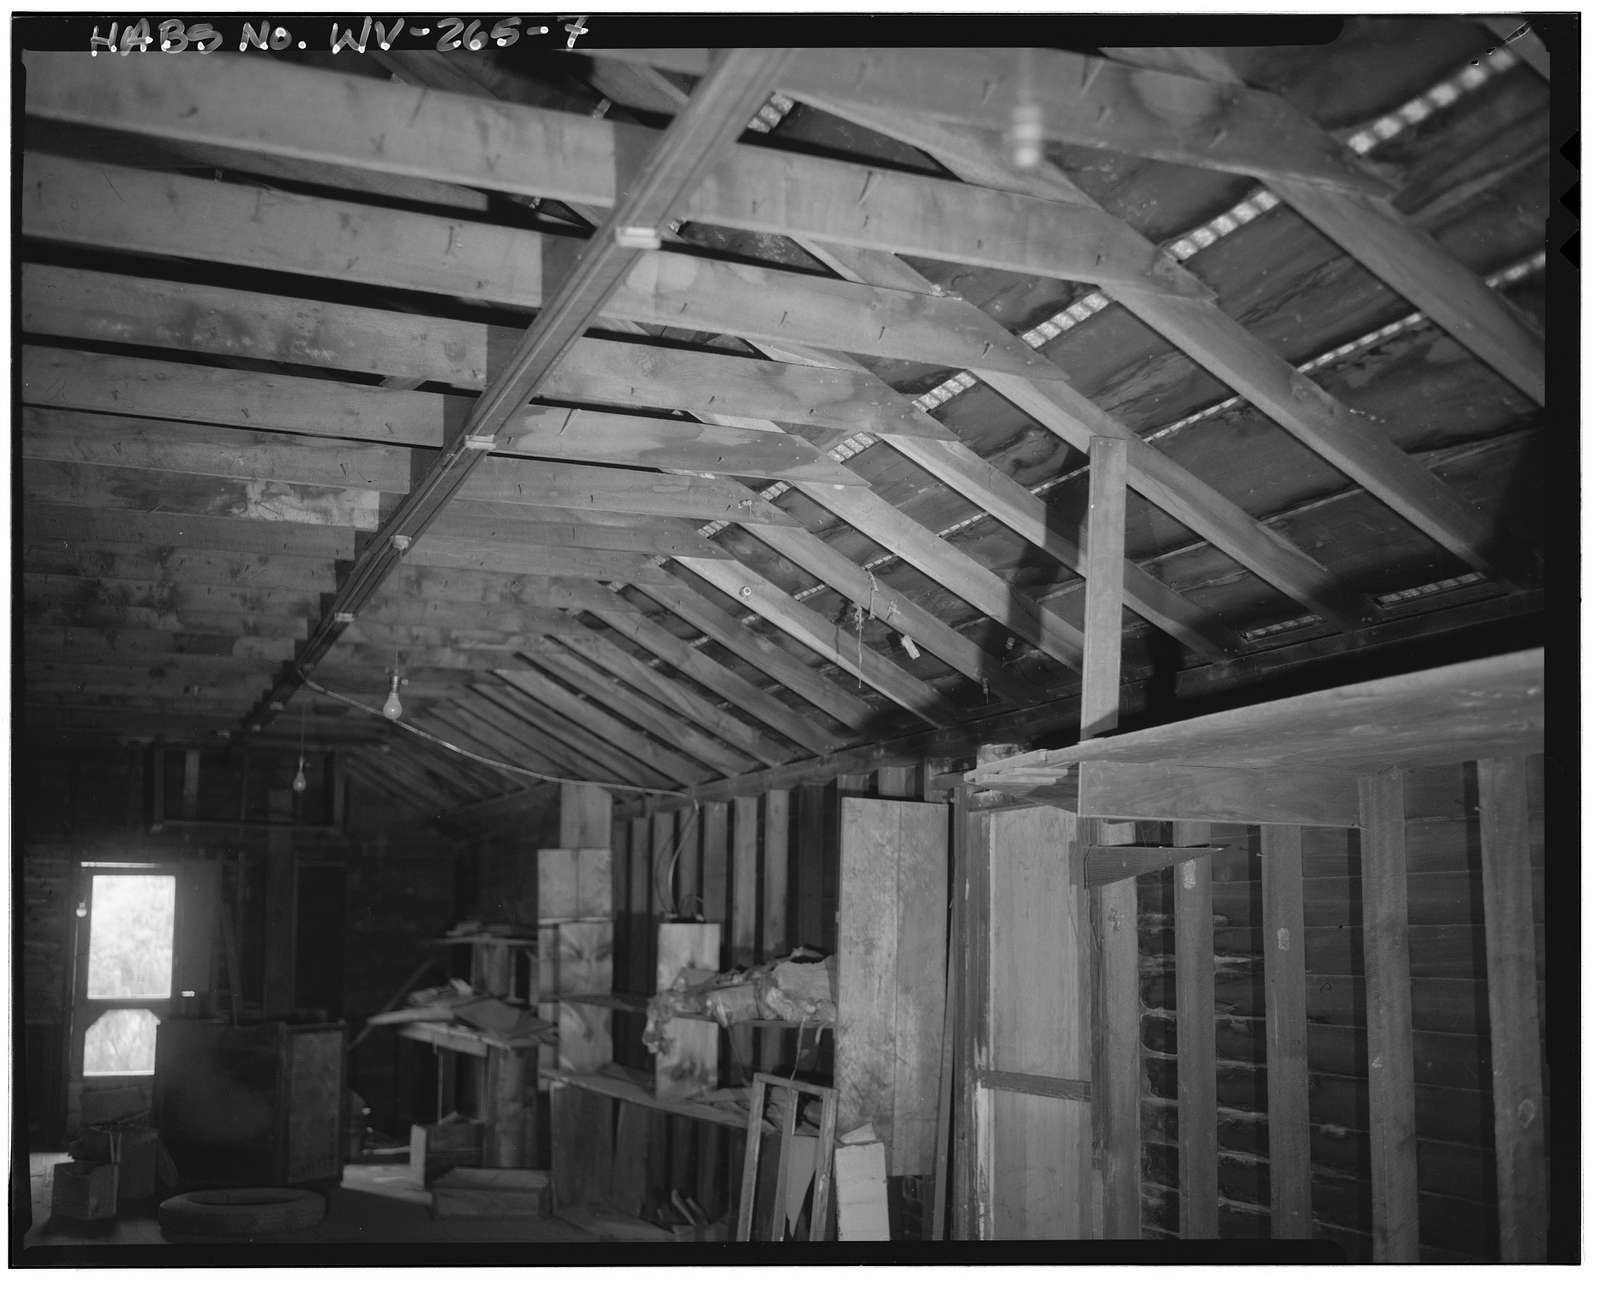 Campbells Creek Coal Company Store, 54 Port Amherst Drive, Campbells Creek vicinity, Charleston, Kanawha County, WV